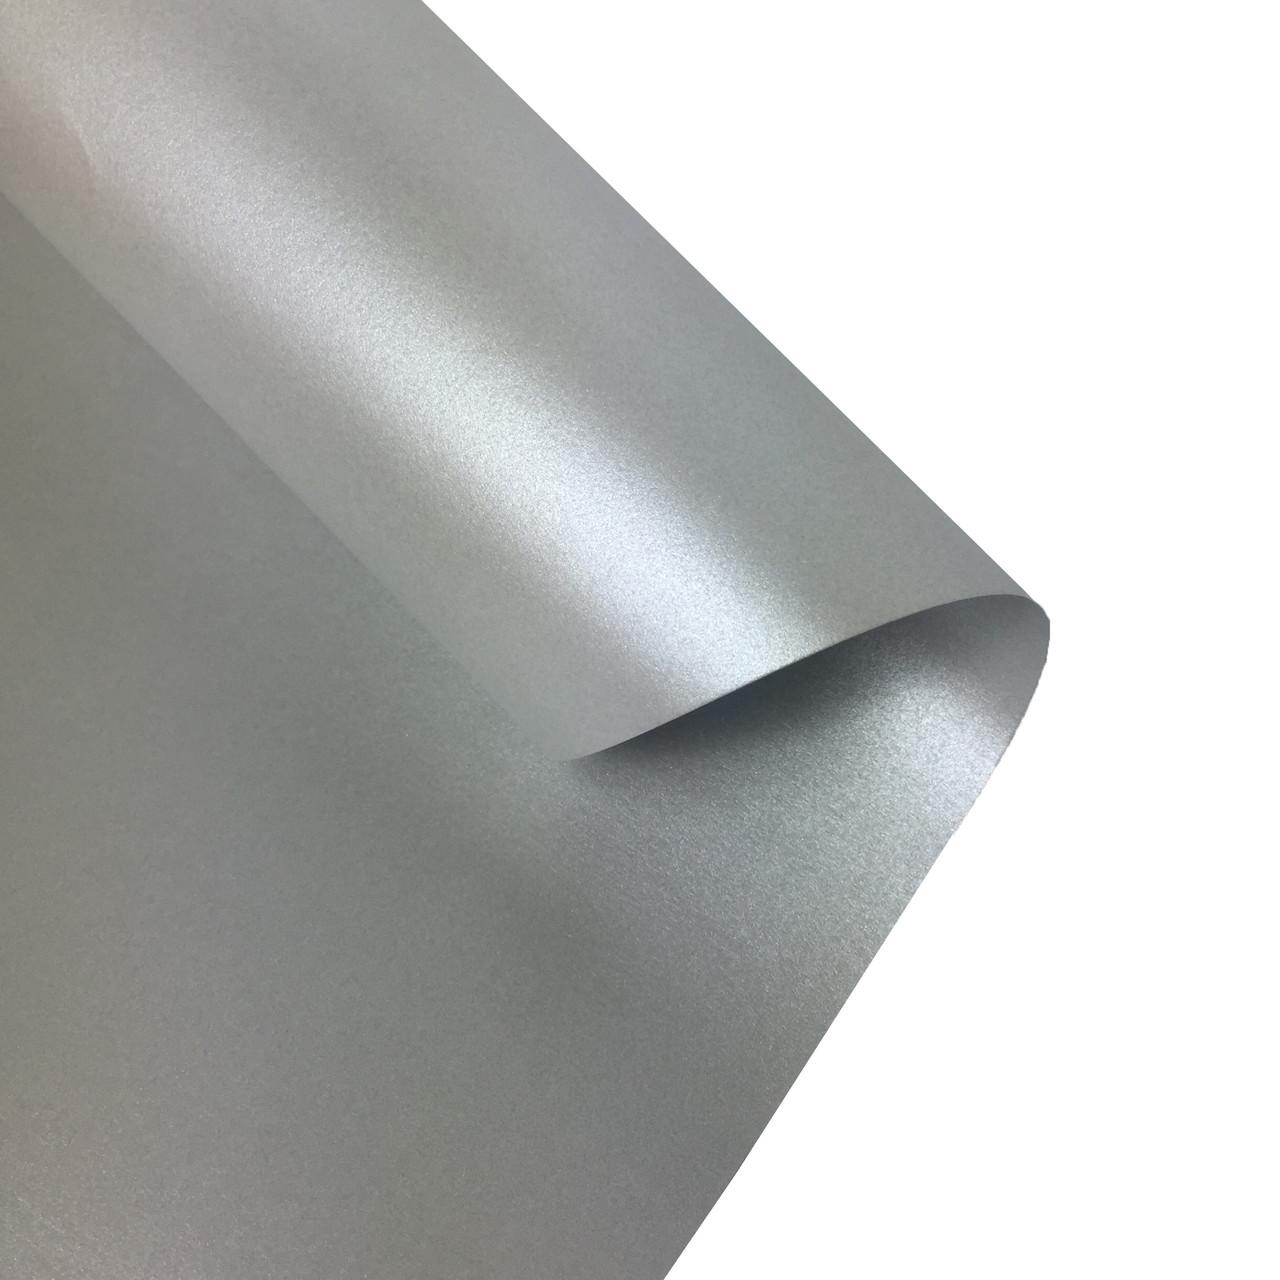 Бумага для дизайна Folia 50 х 70 см, серебро